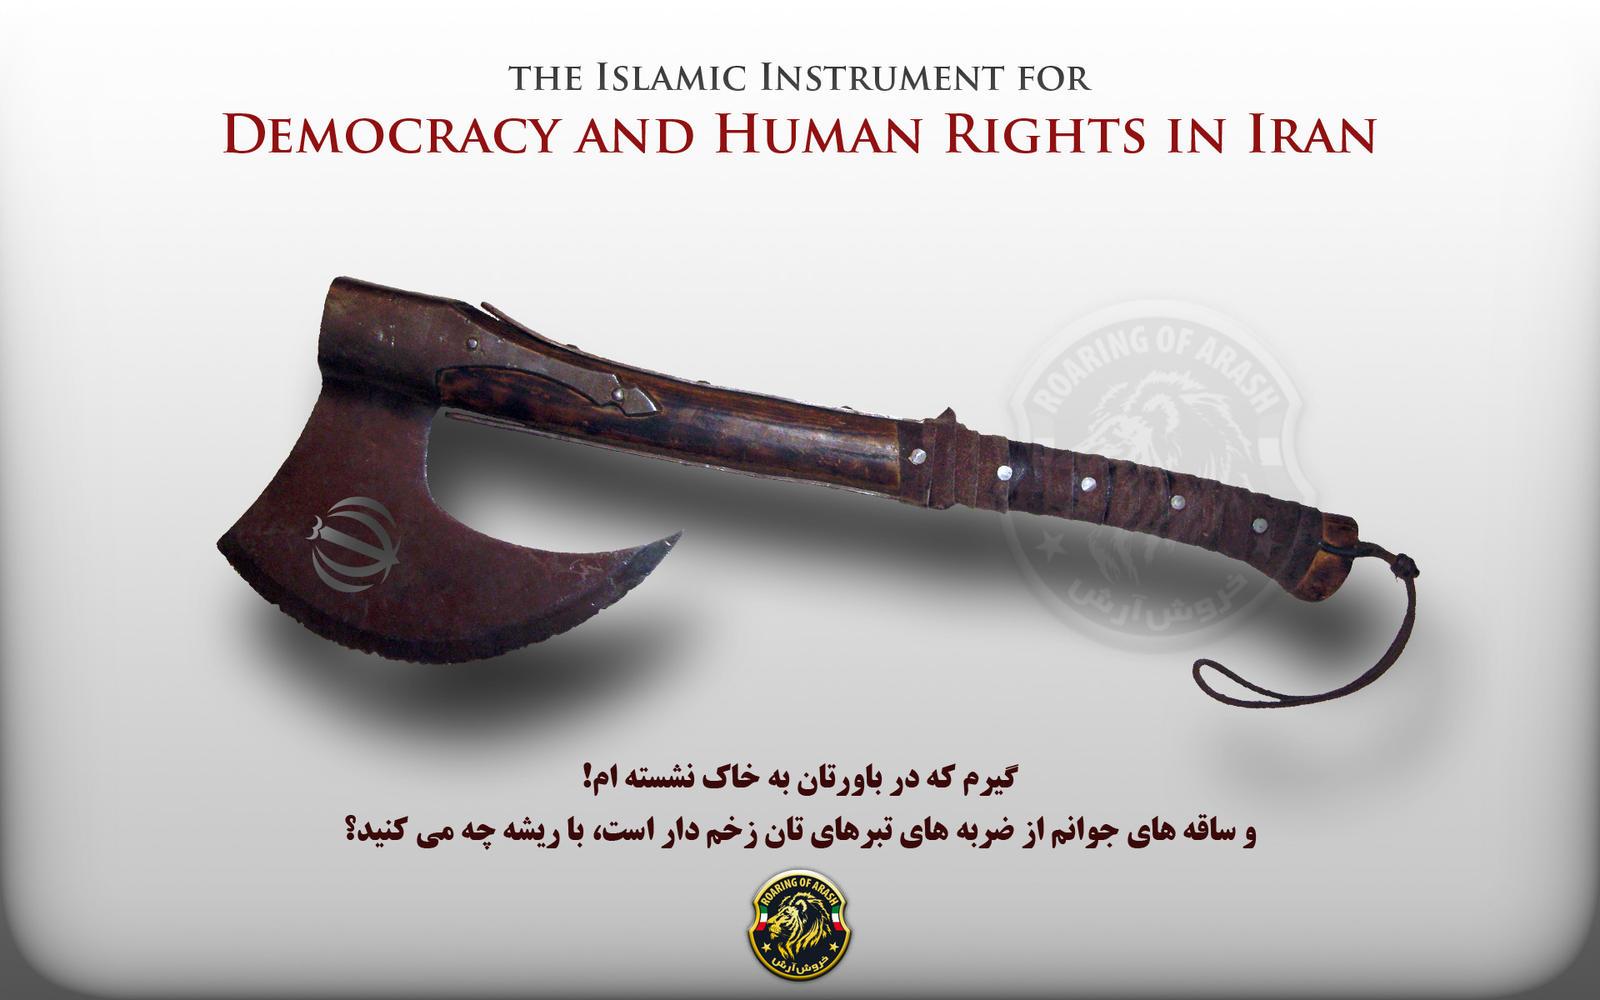 Human Rights Instrument Iran by arasch